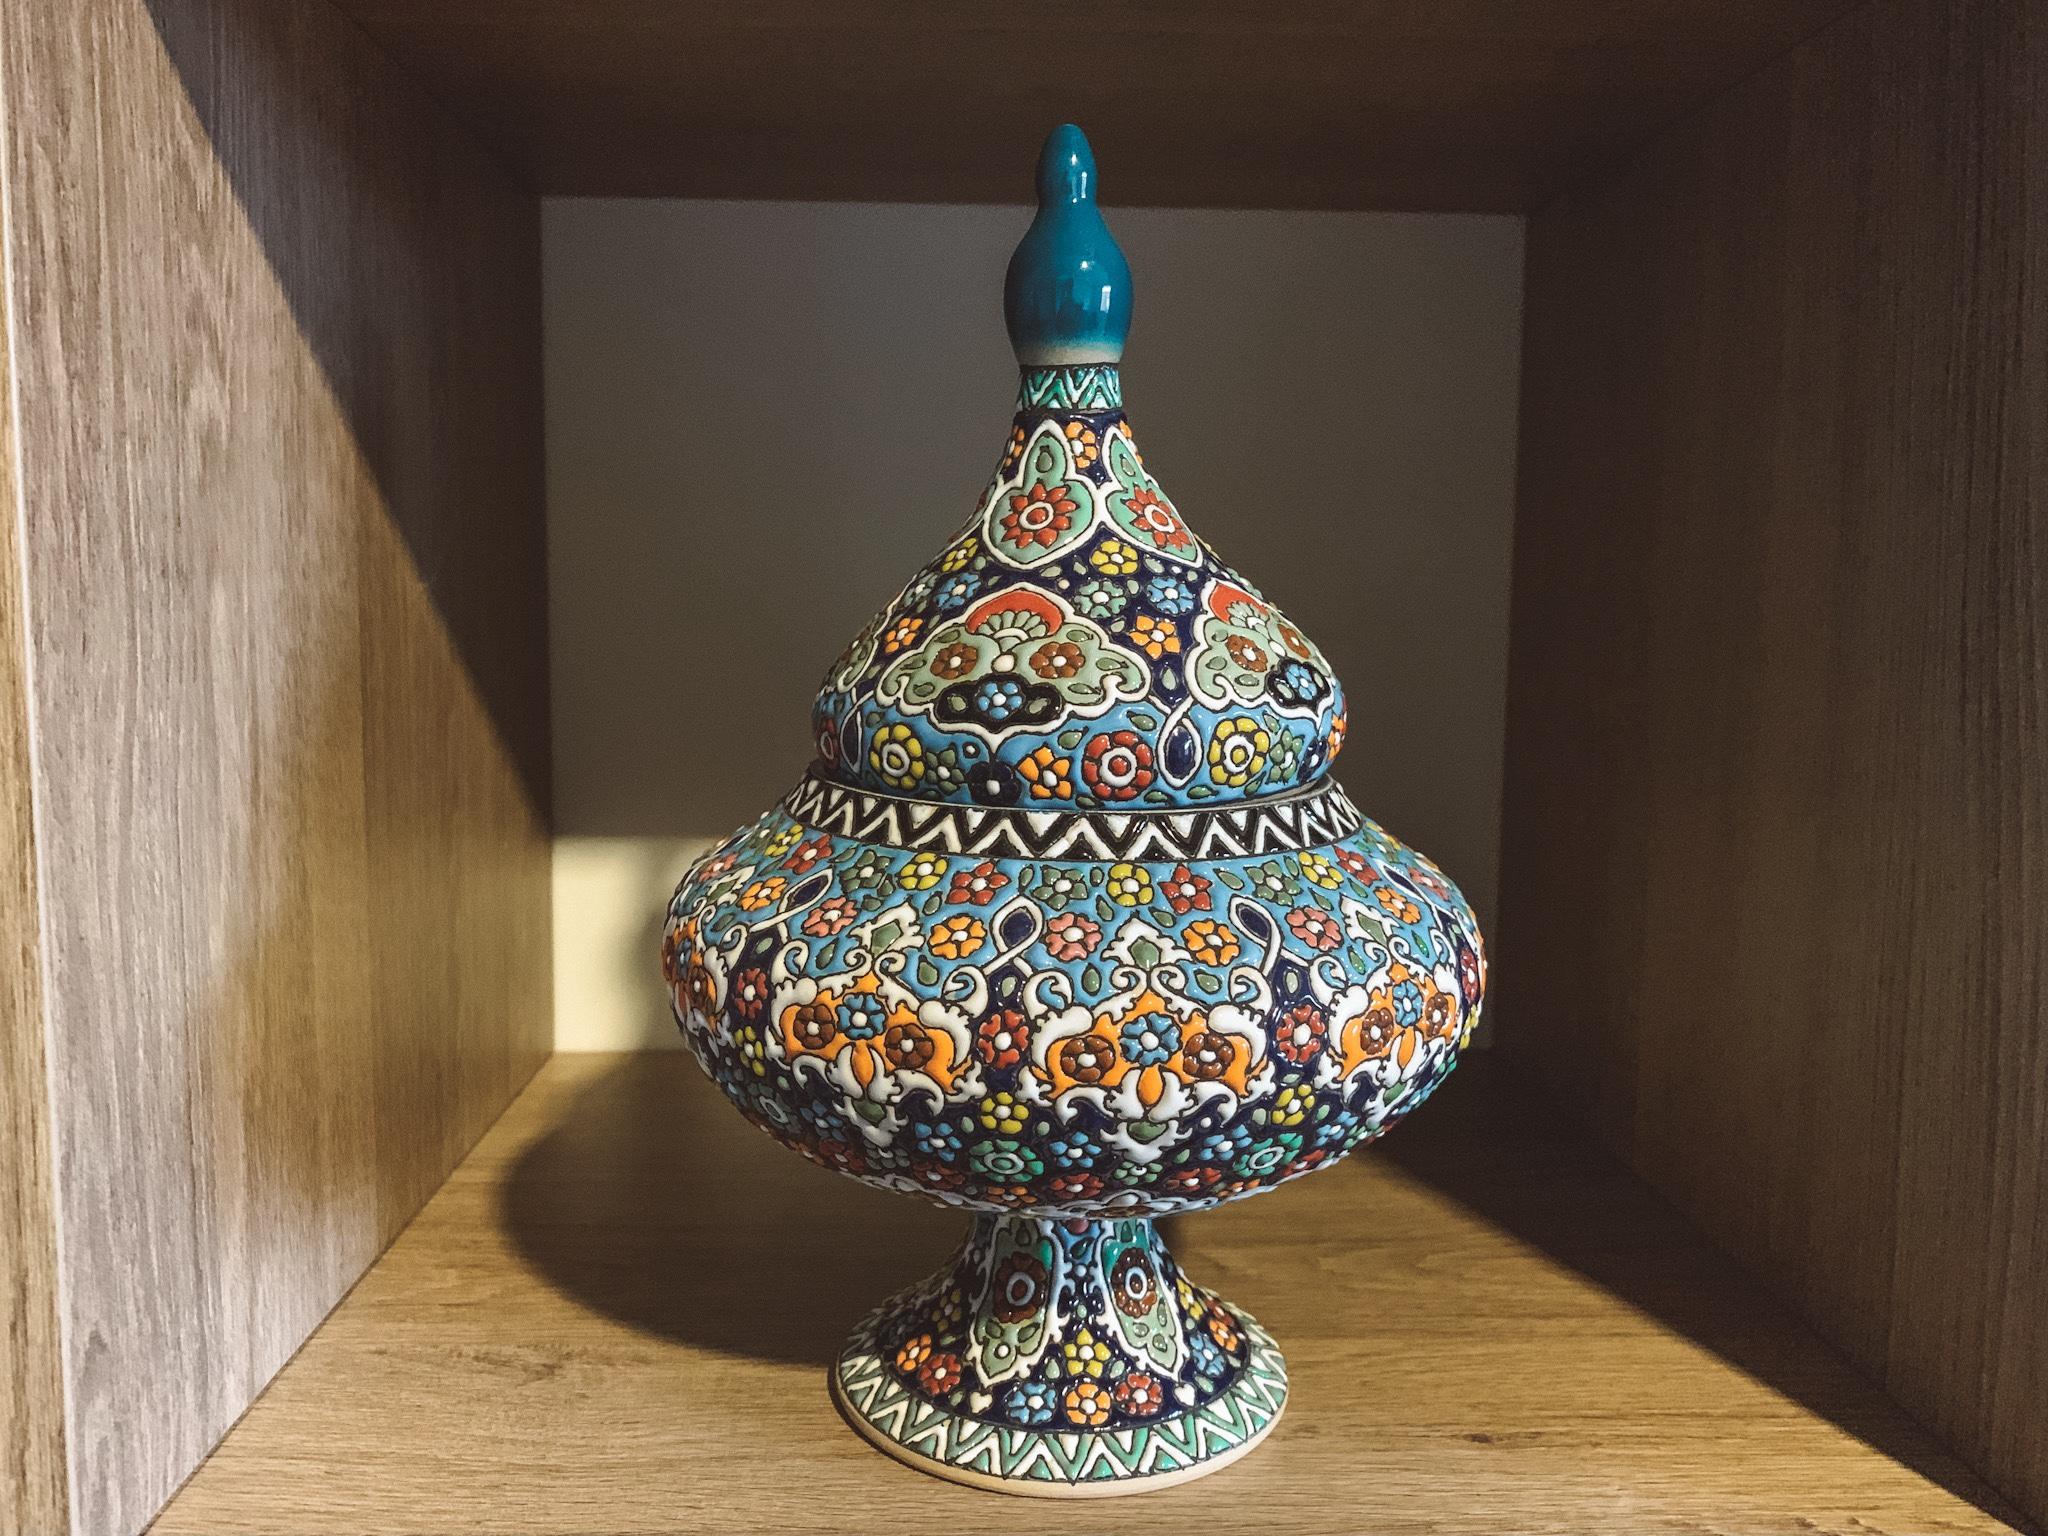 O que comprar no Irã:  Bomboniere de 18 dólares